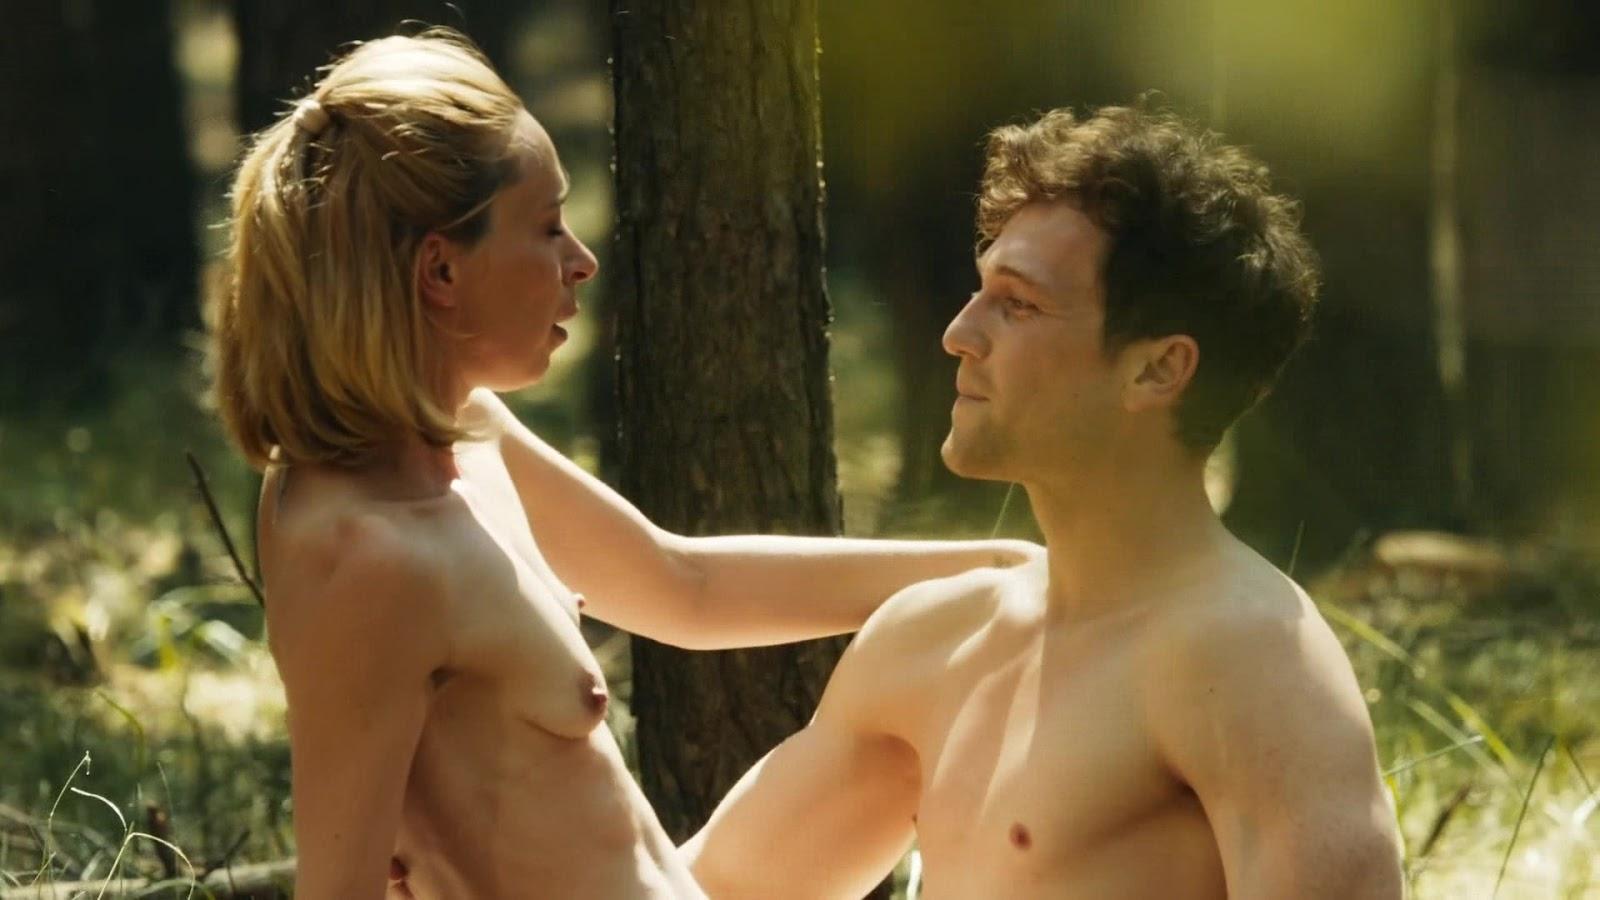 Andrea Elson Nackt shirtless men on the blog: artjom gilz shirtless